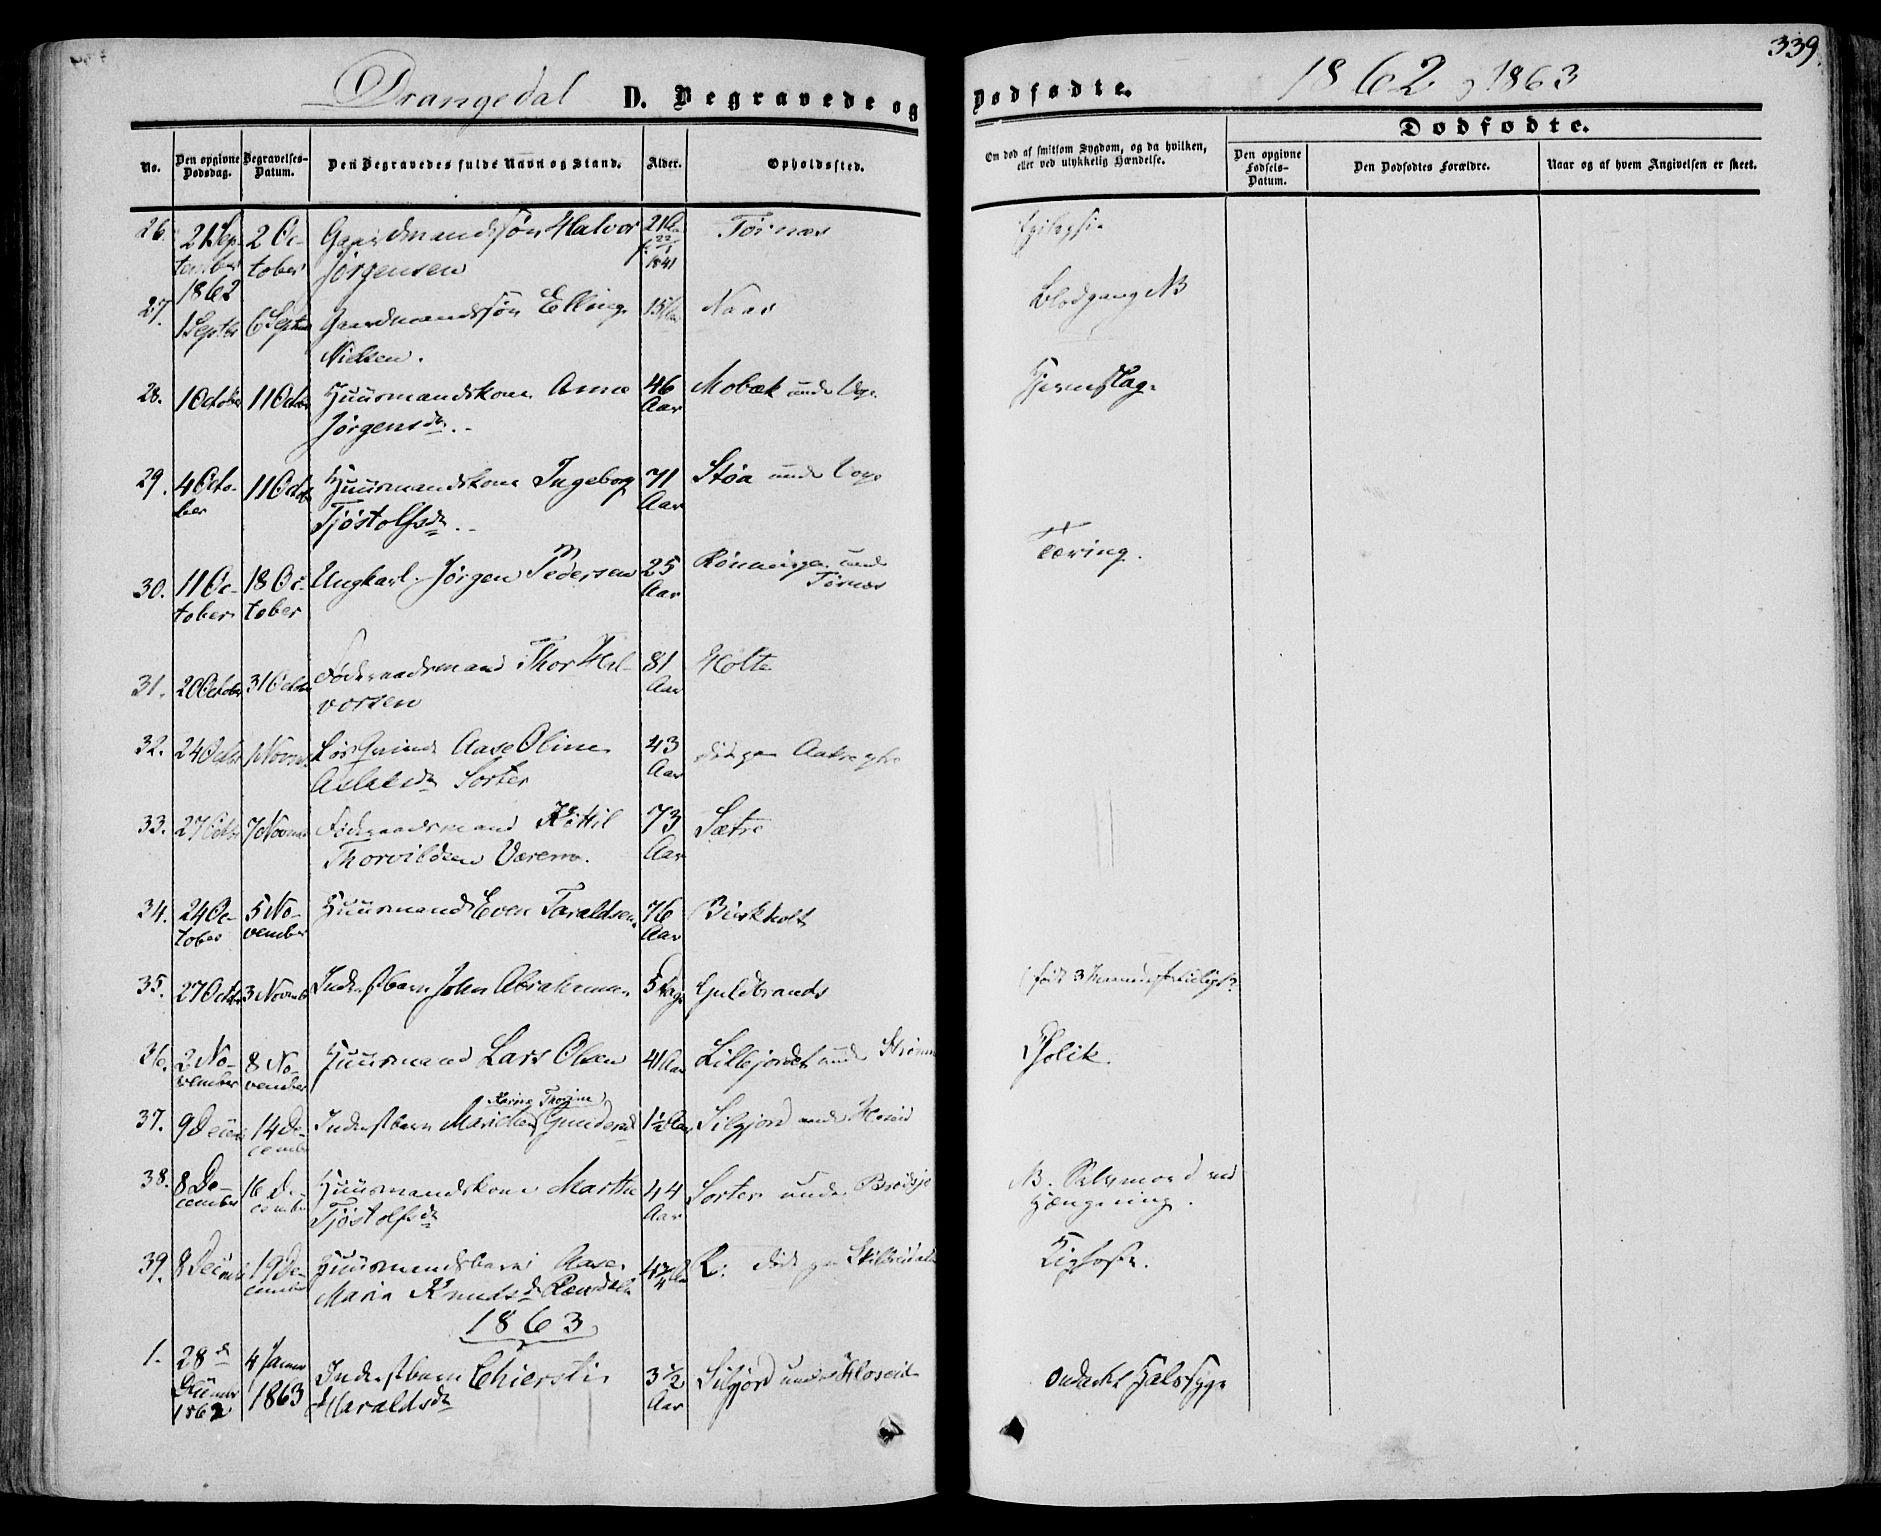 SAKO, Drangedal kirkebøker, F/Fa/L0008: Ministerialbok nr. 8, 1857-1871, s. 339